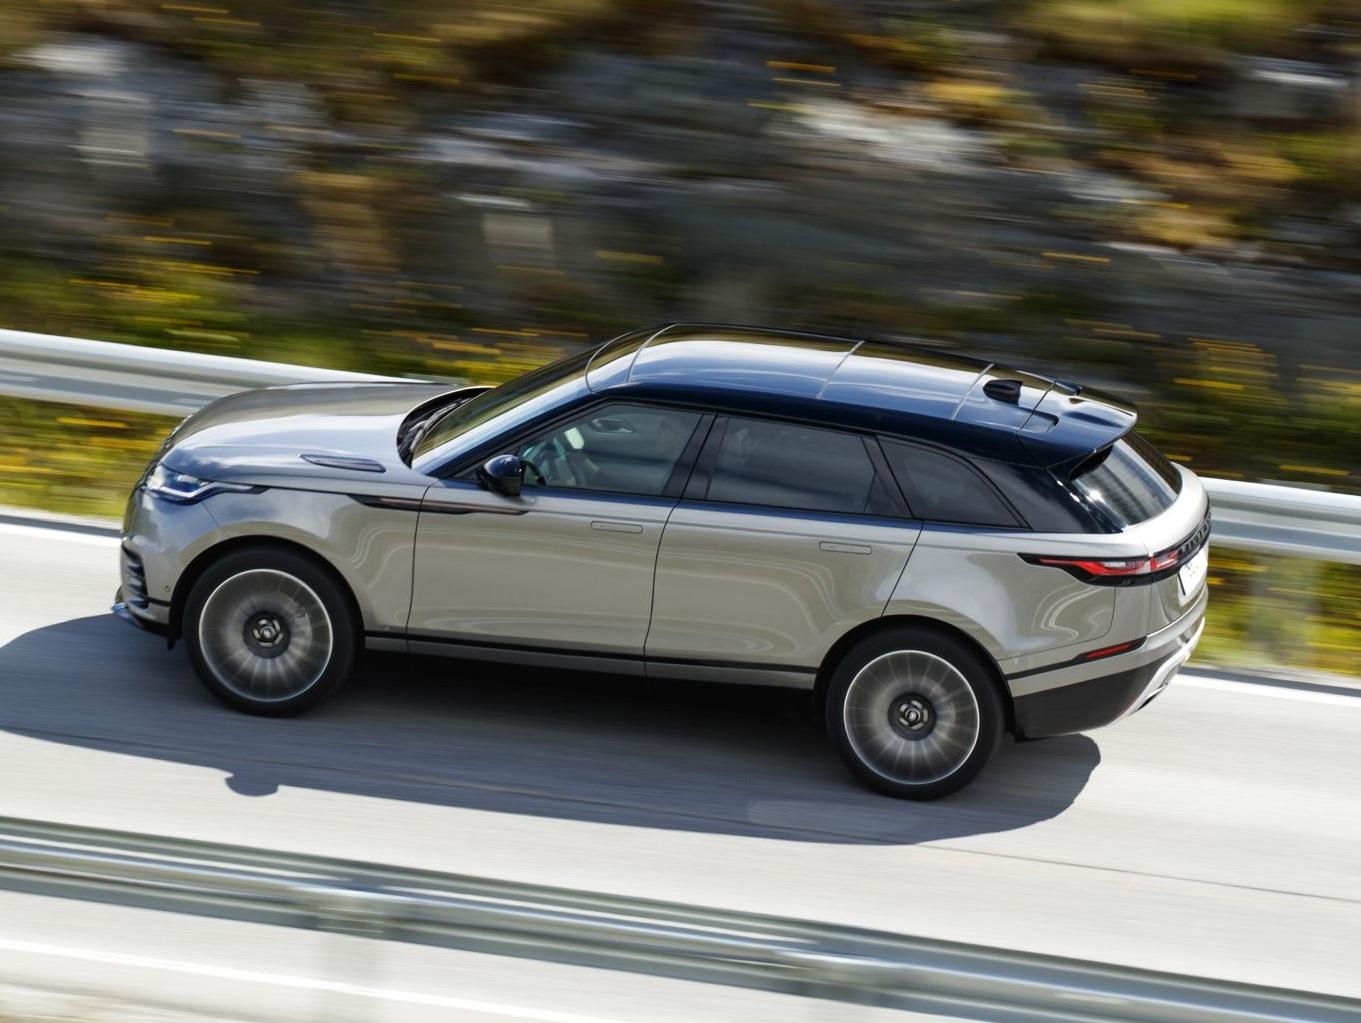 First Drive: 2018 Range Rover Velar